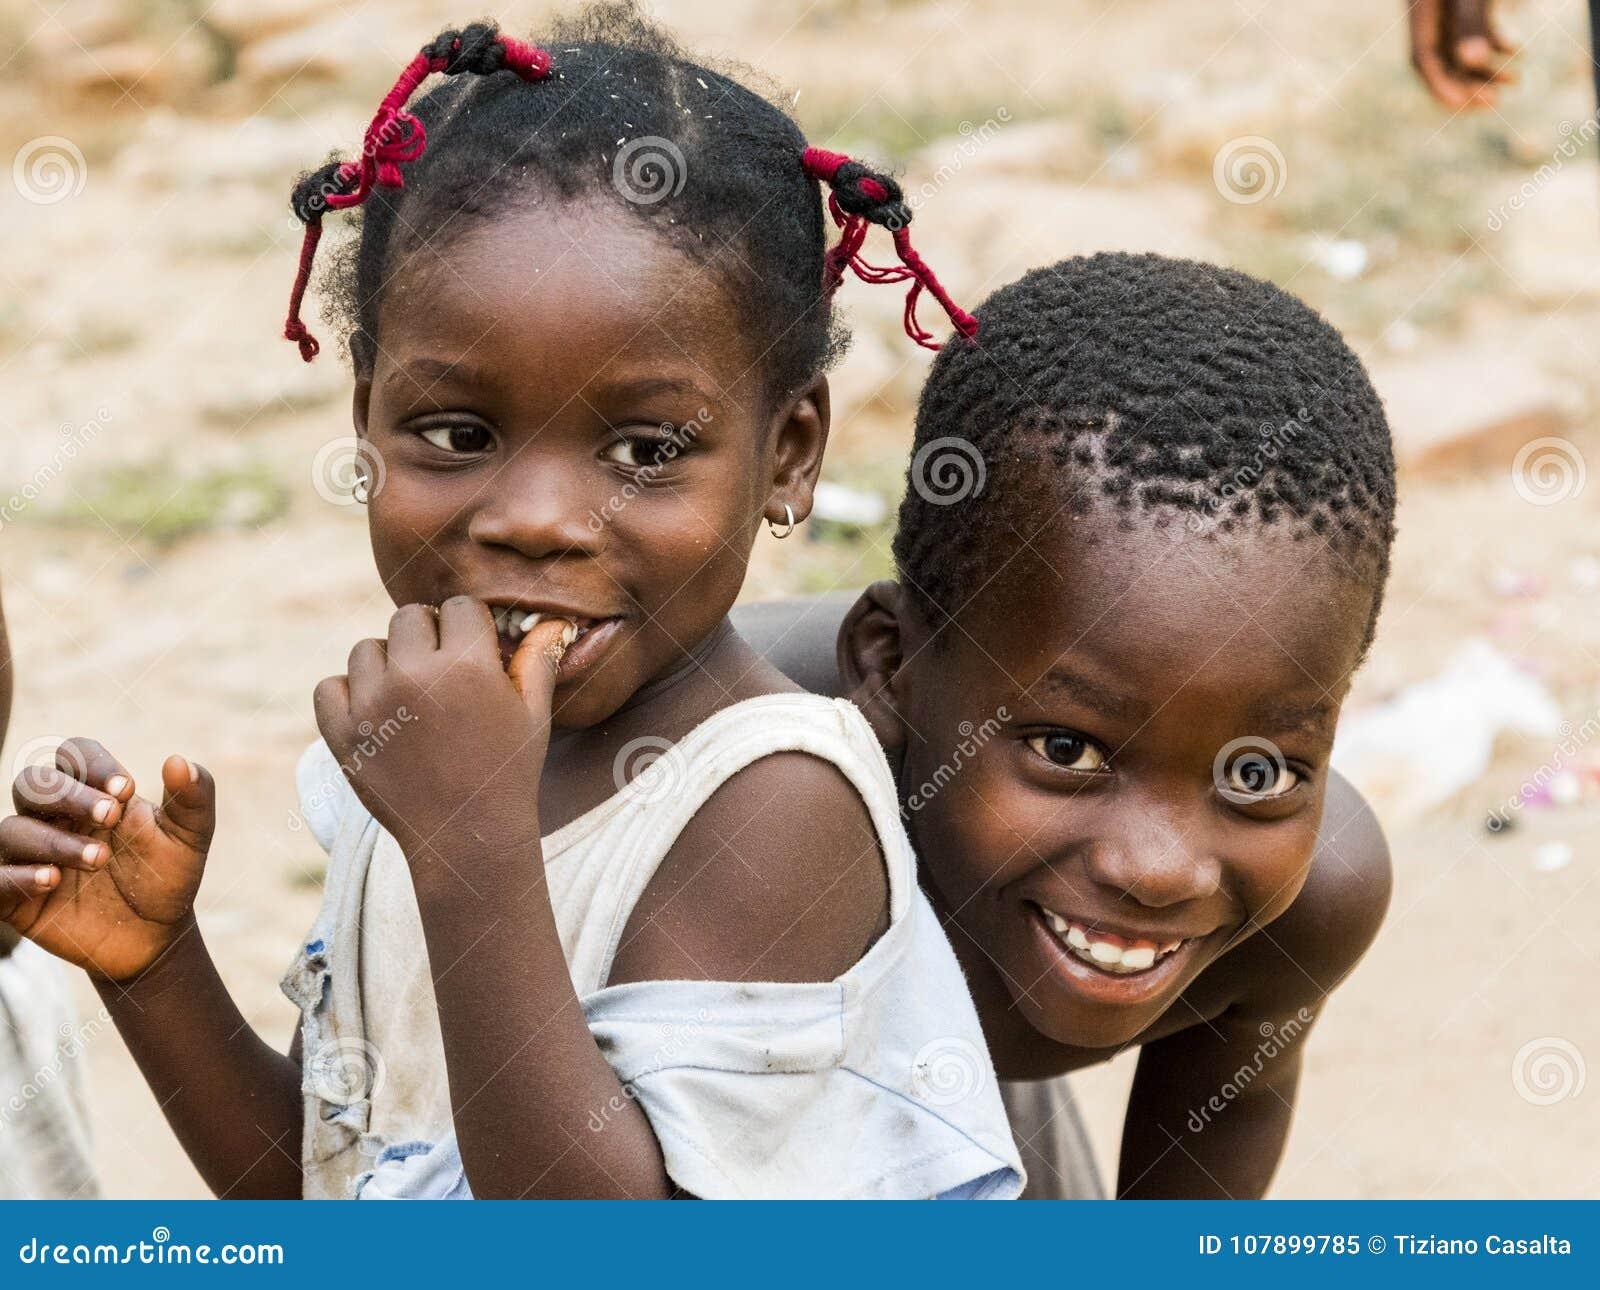 b08bf12569188 African children in ghana editorial image. Image of poor - 107899785